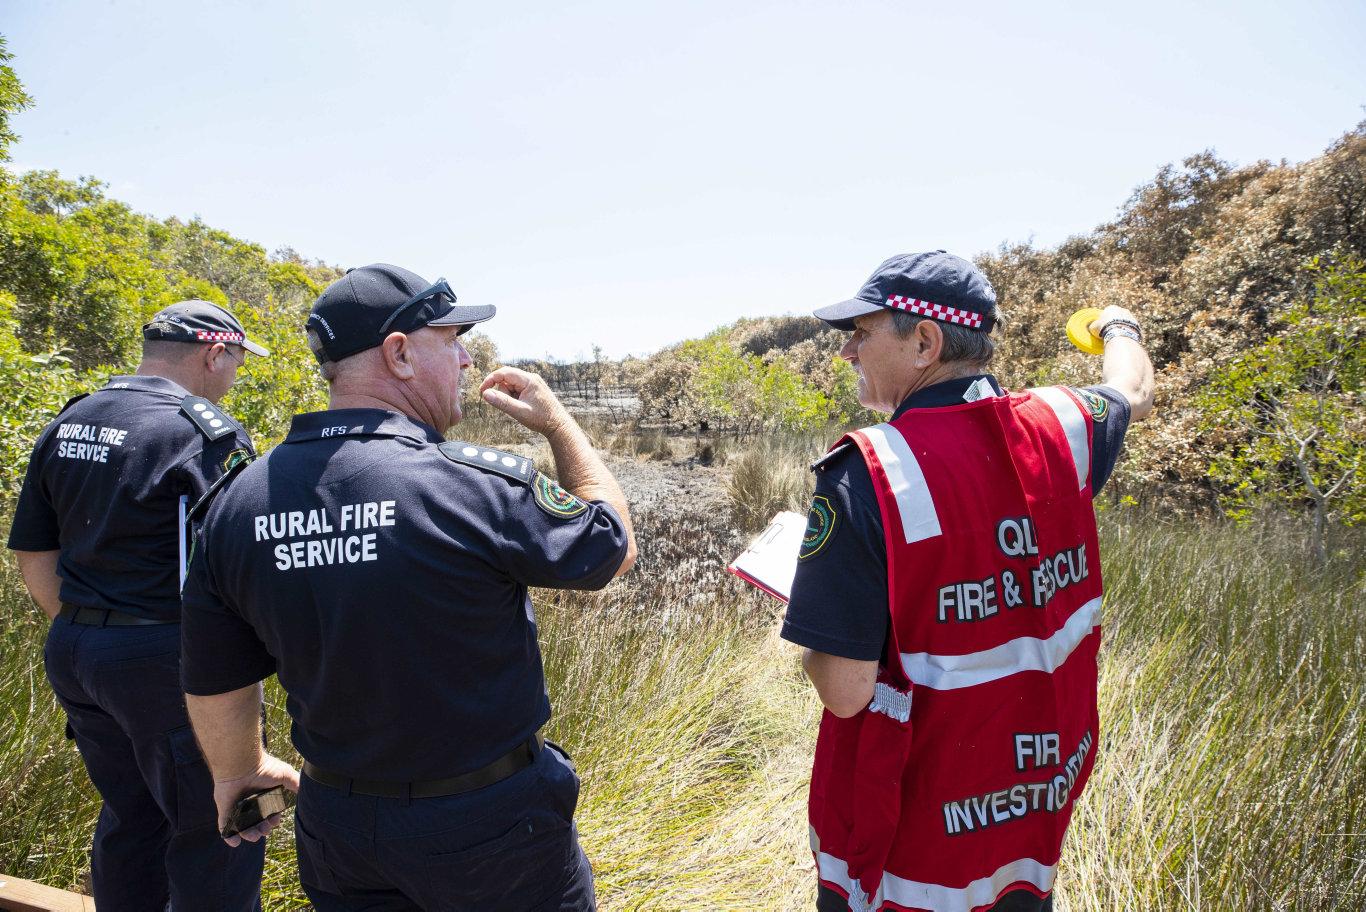 Fire investigators at the scene near the ignition point of Wednesday's Peregian Beach bushfire. Photo: Lachie Millard